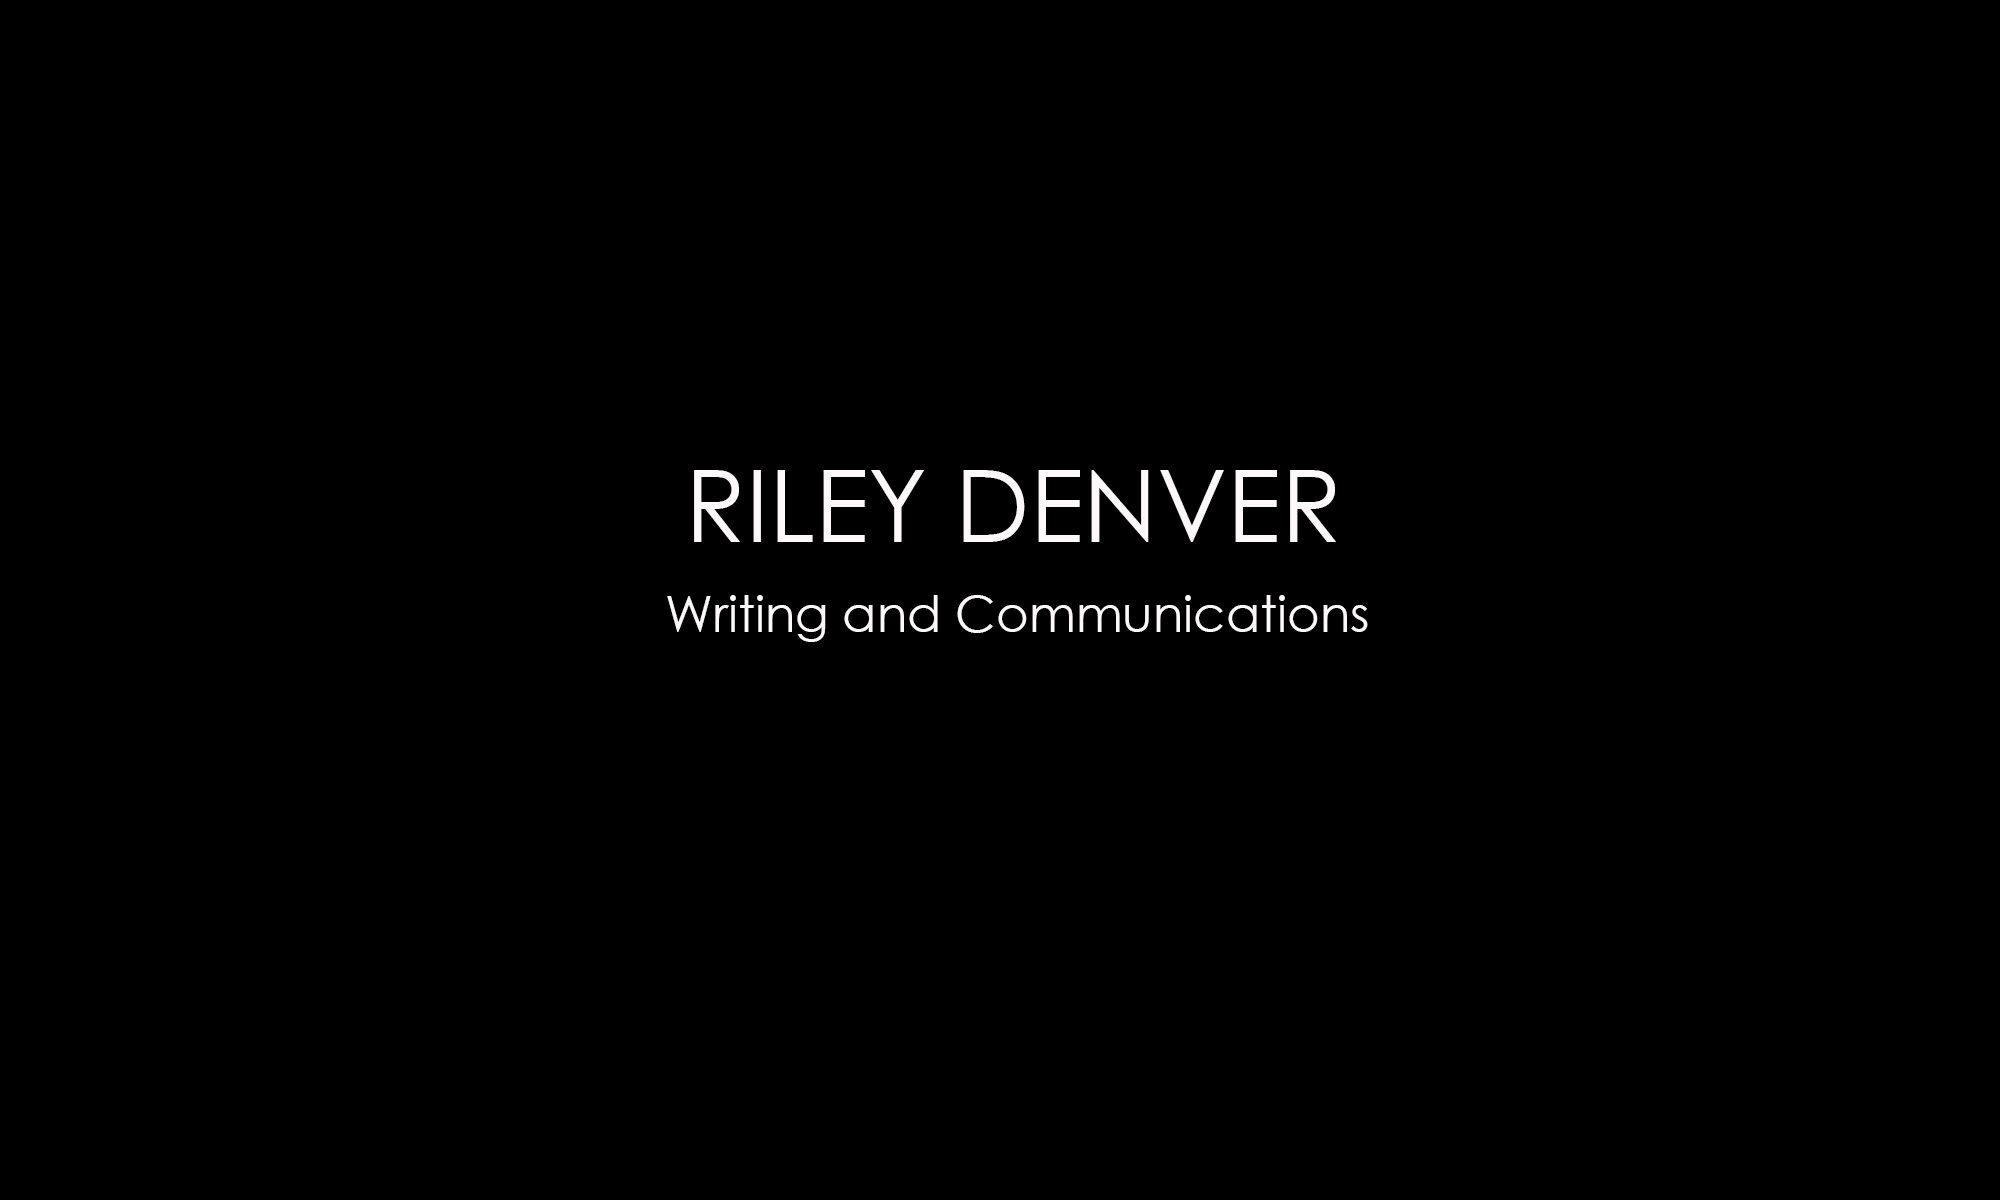 Riley Denver